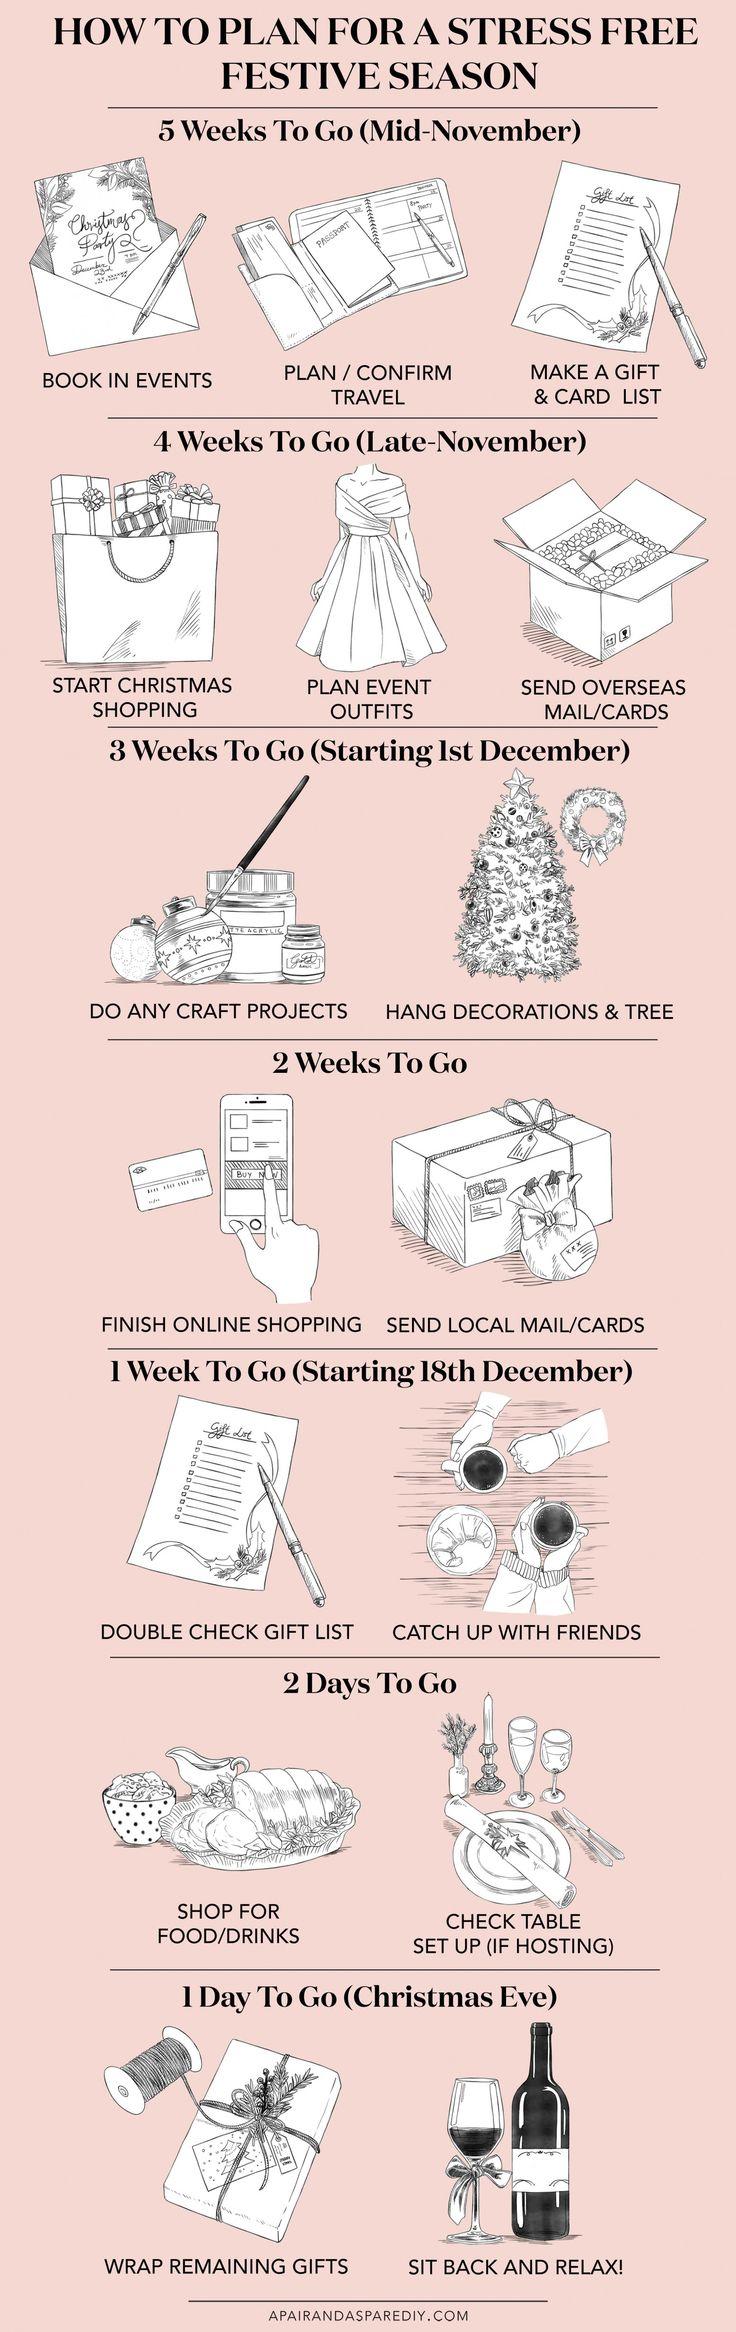 How to plan for a stress free festive season. Christmas Checklist